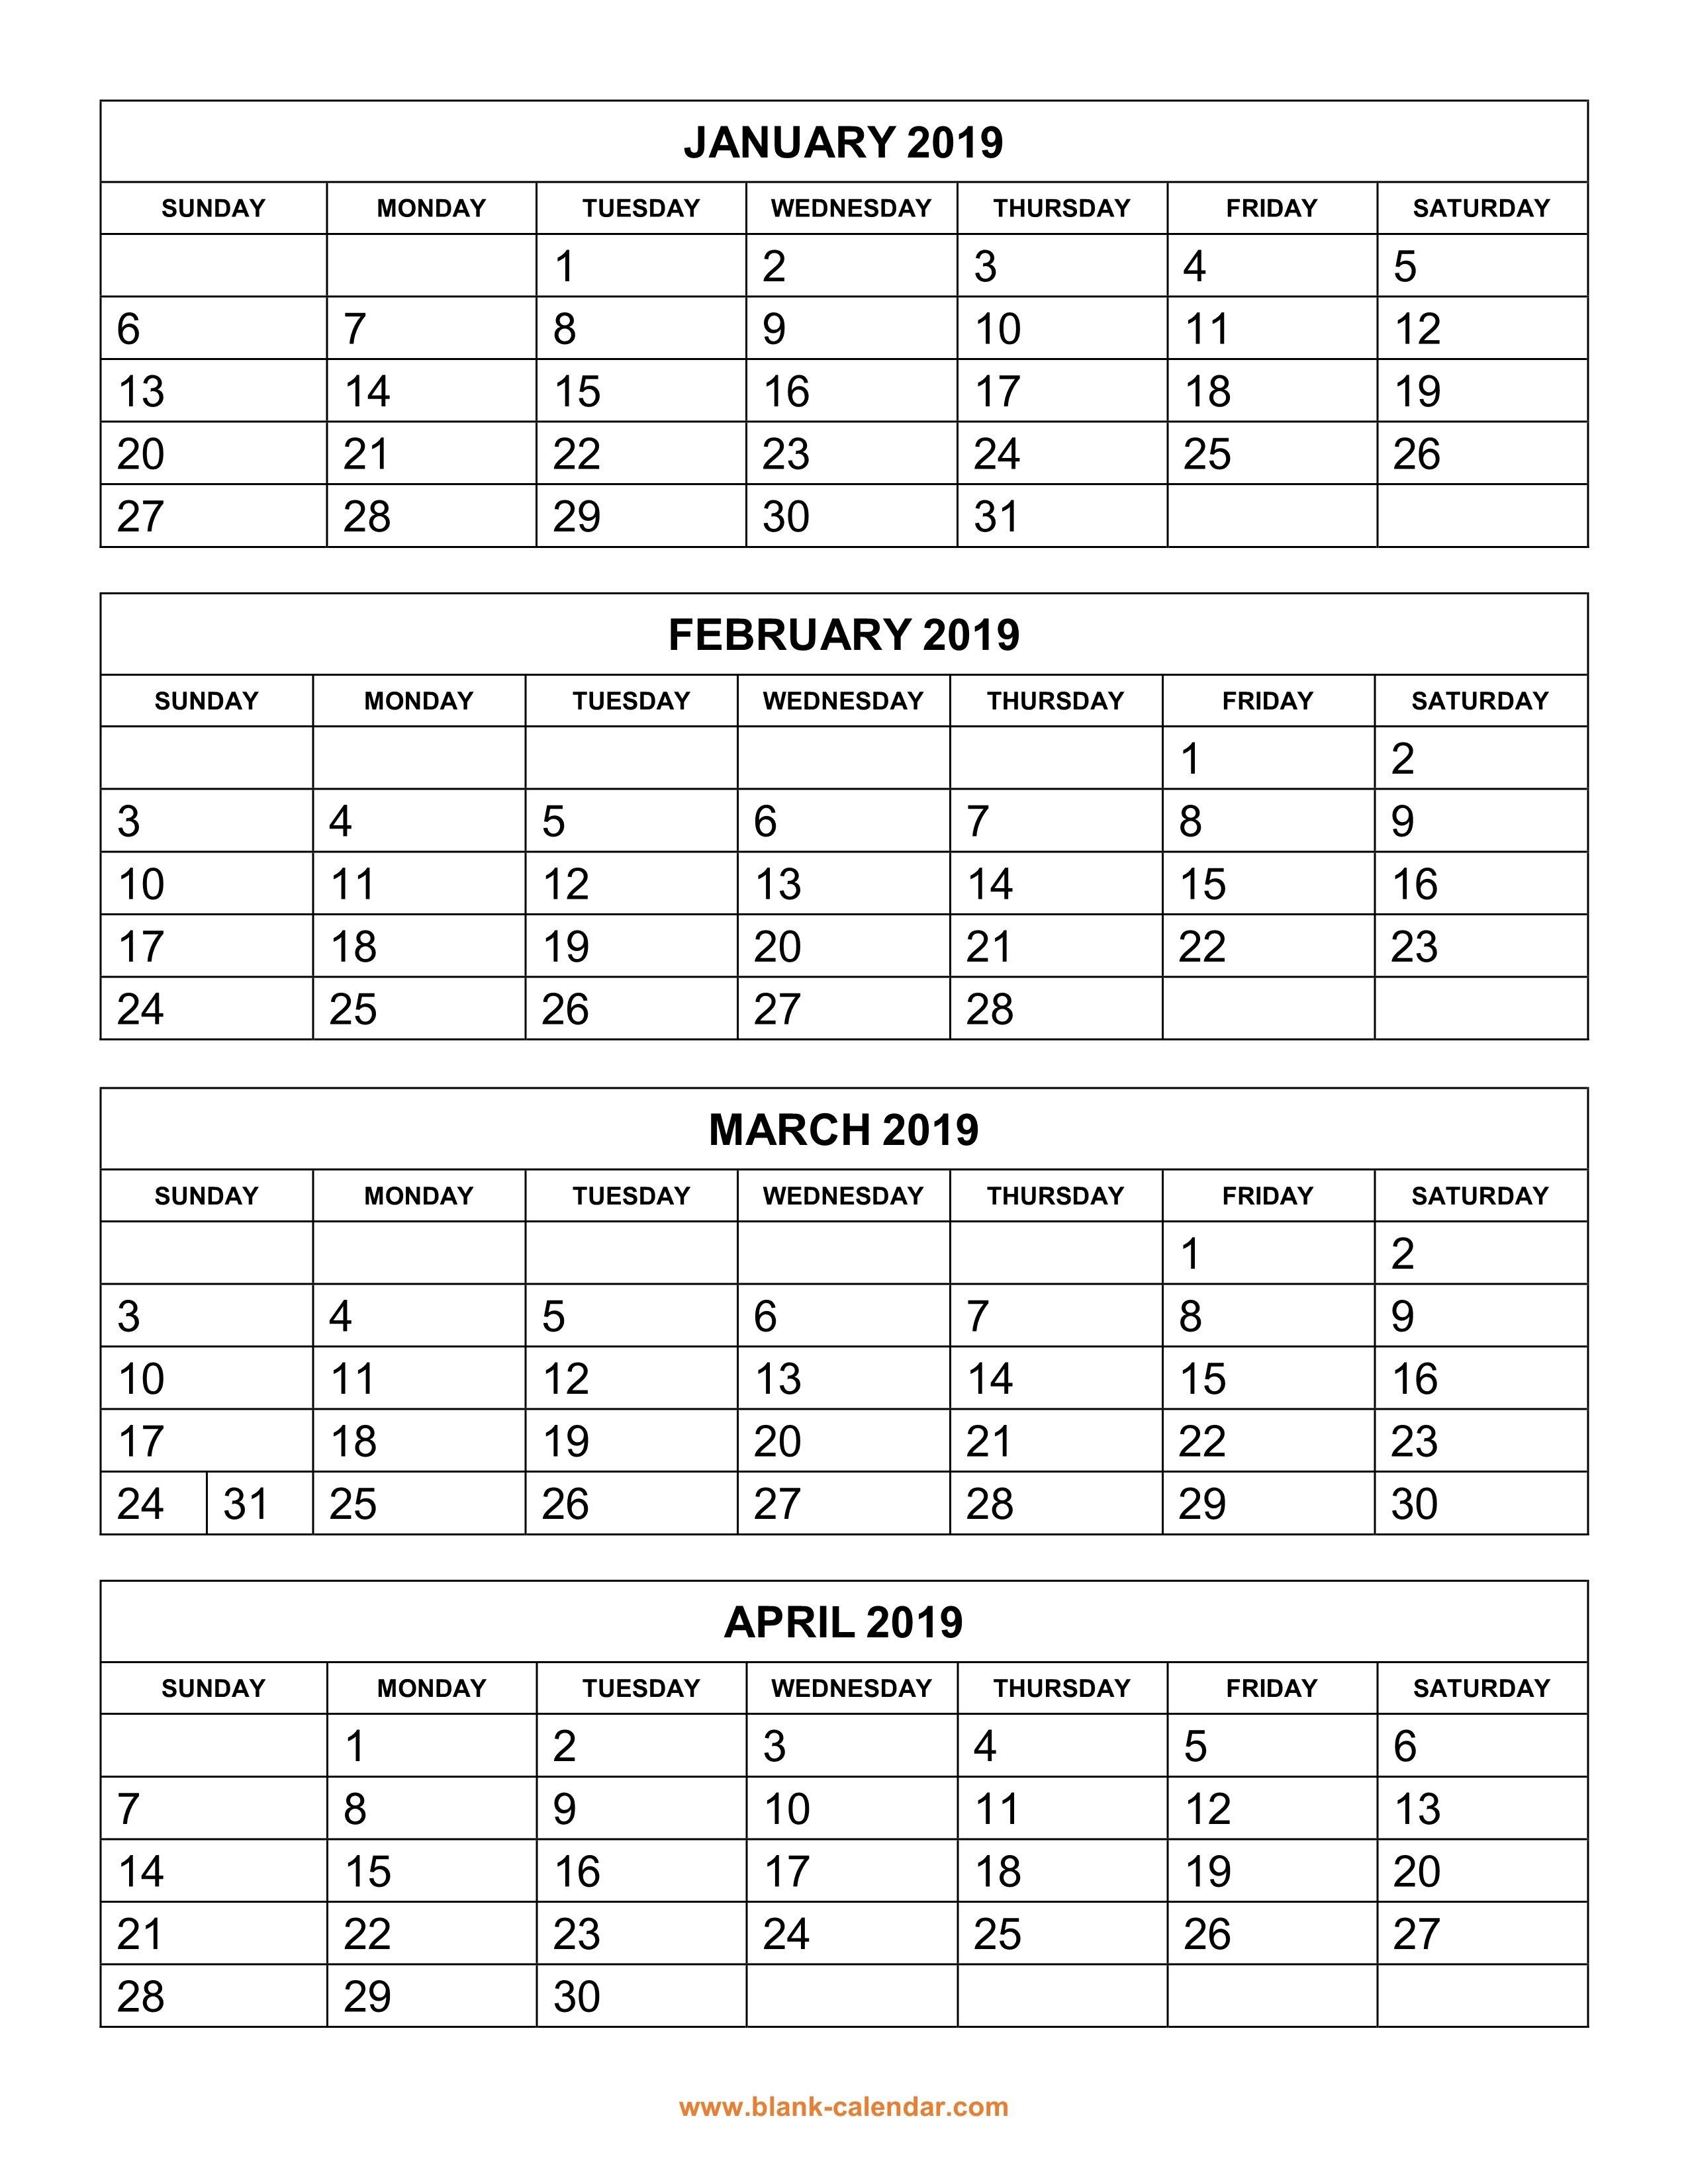 Free Download Printable Calendar 2019, 4 Months Per Page, 3 Pages 3 Month Calendar 2019 Printable